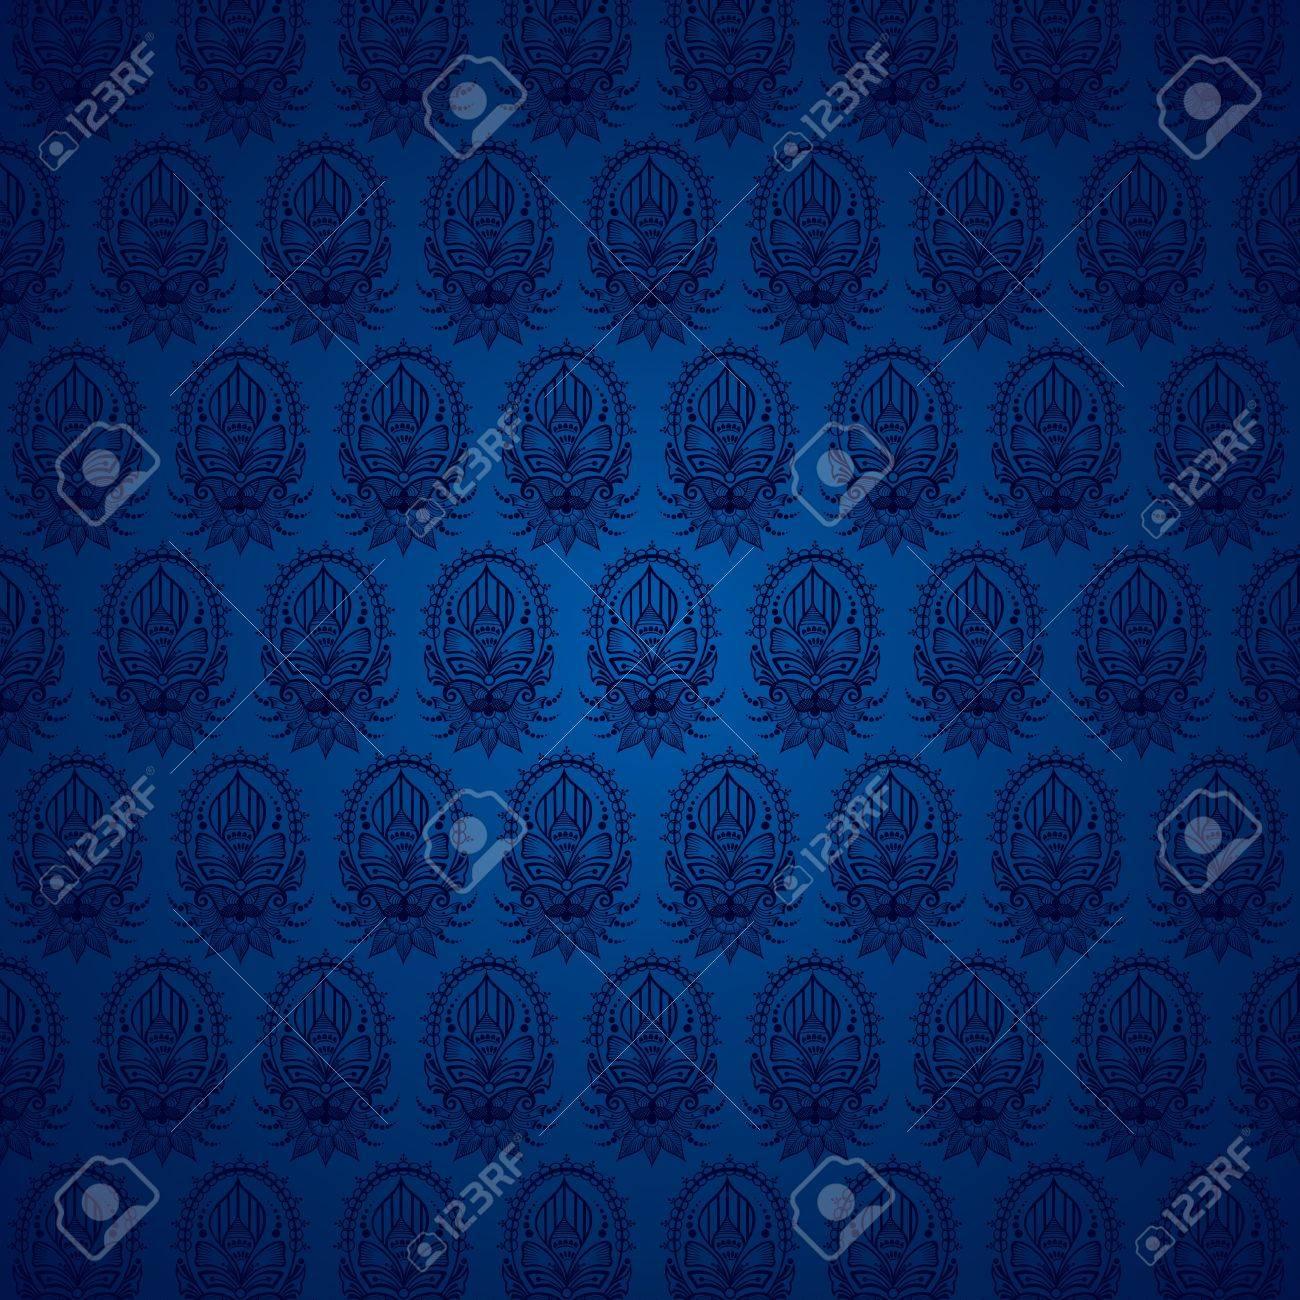 creative classic blue wedding invitation pattern stock vector Stock Vector - 16845880